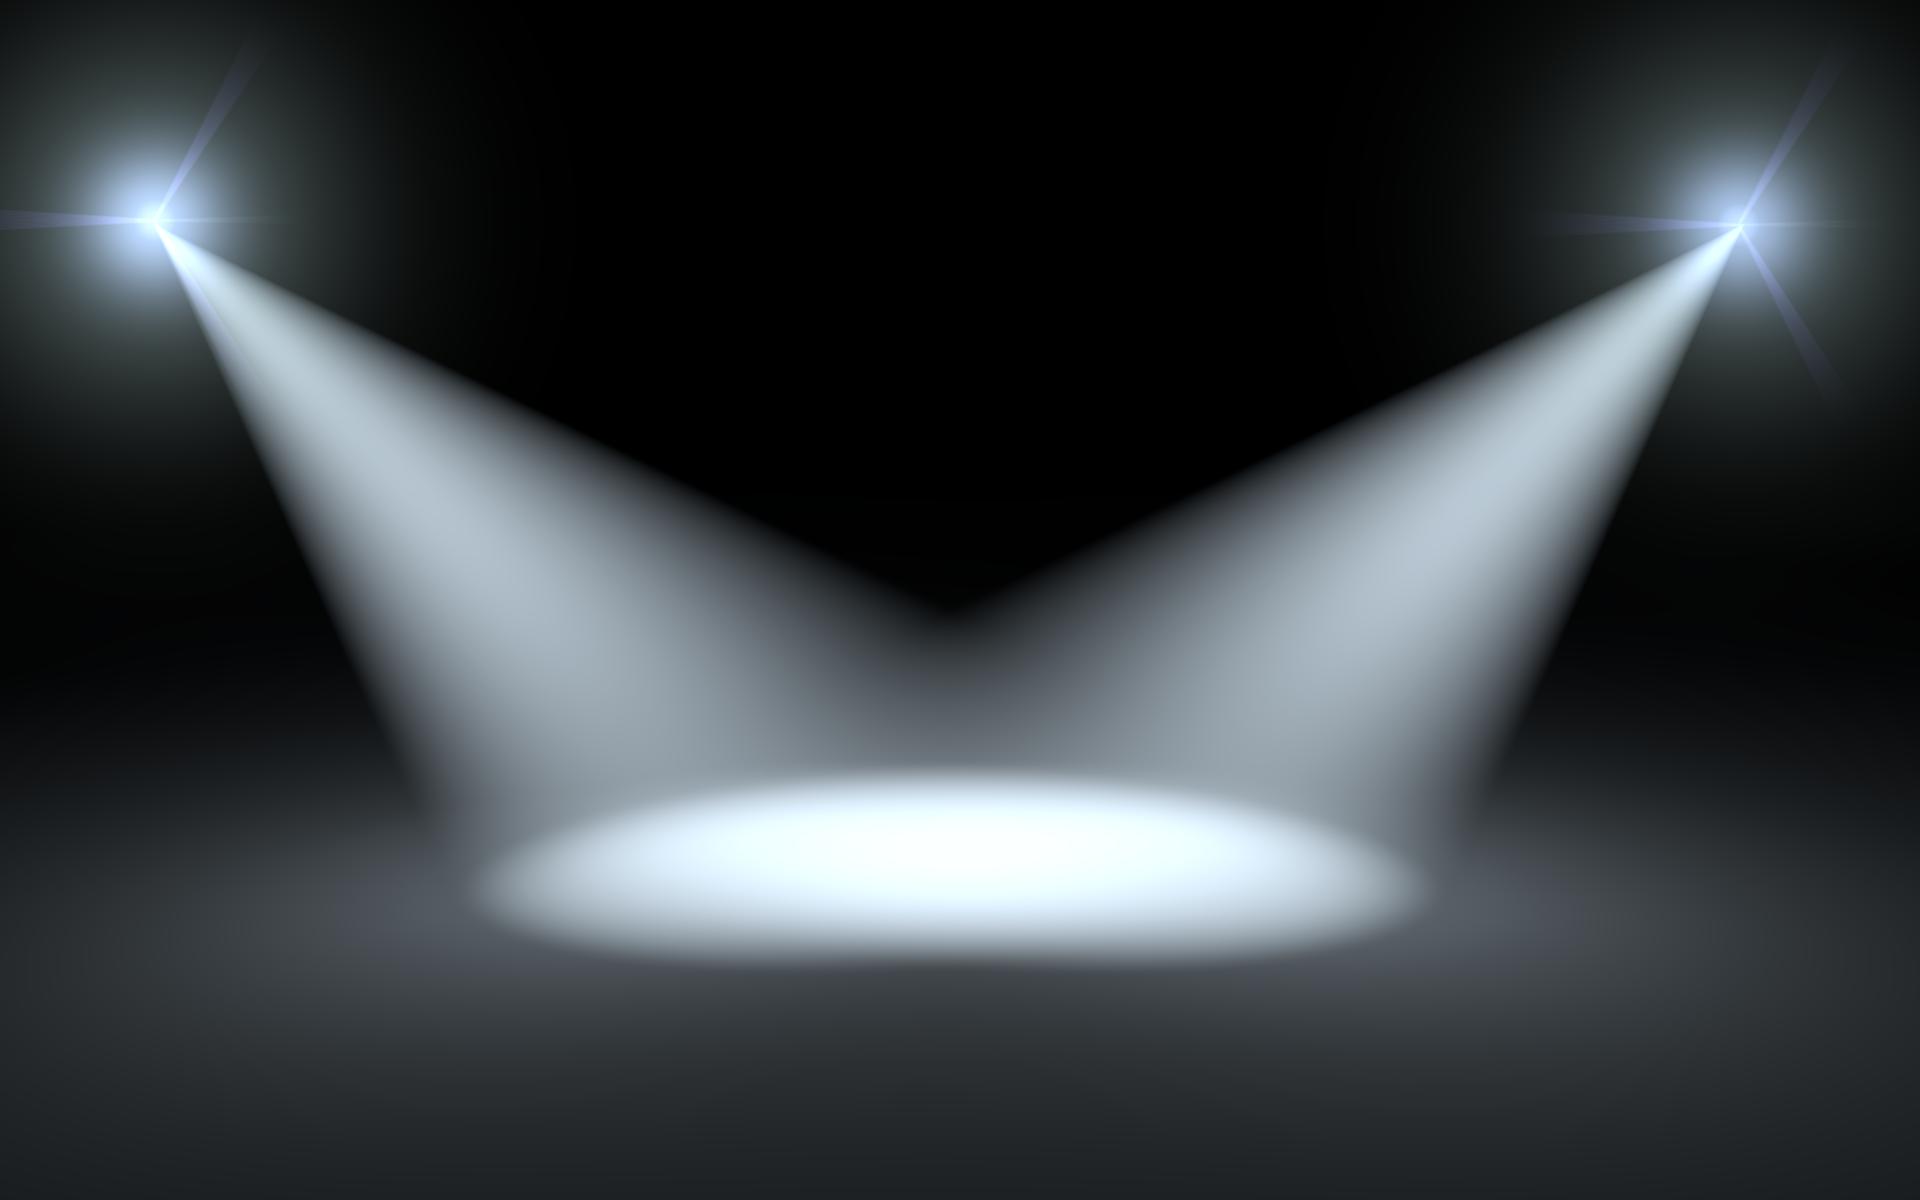 Spotlight Png Hd Free Transparent Images Pluspng Congratulations Stage Lights Clip Art